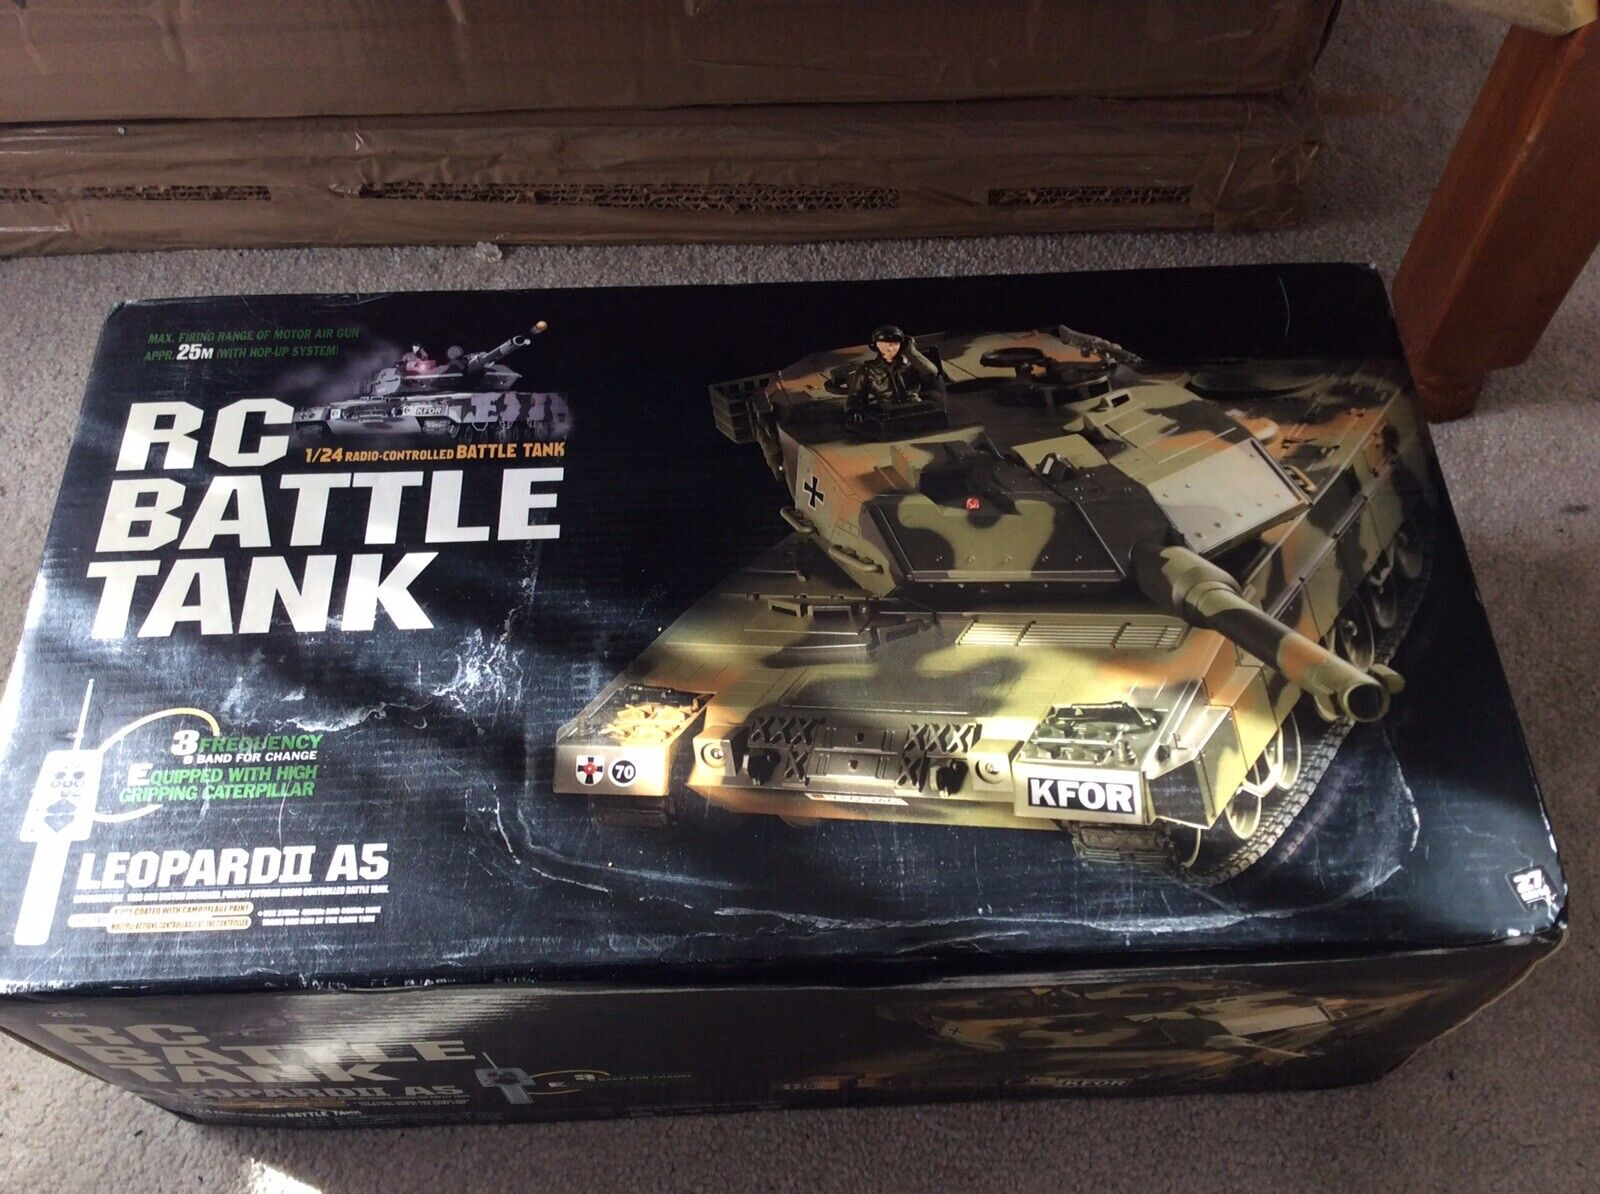 R C Battle Battle Battle Tank 2.4g German Leopard II A5 1 24 Radio Controlled Tank TAMIYA 29d